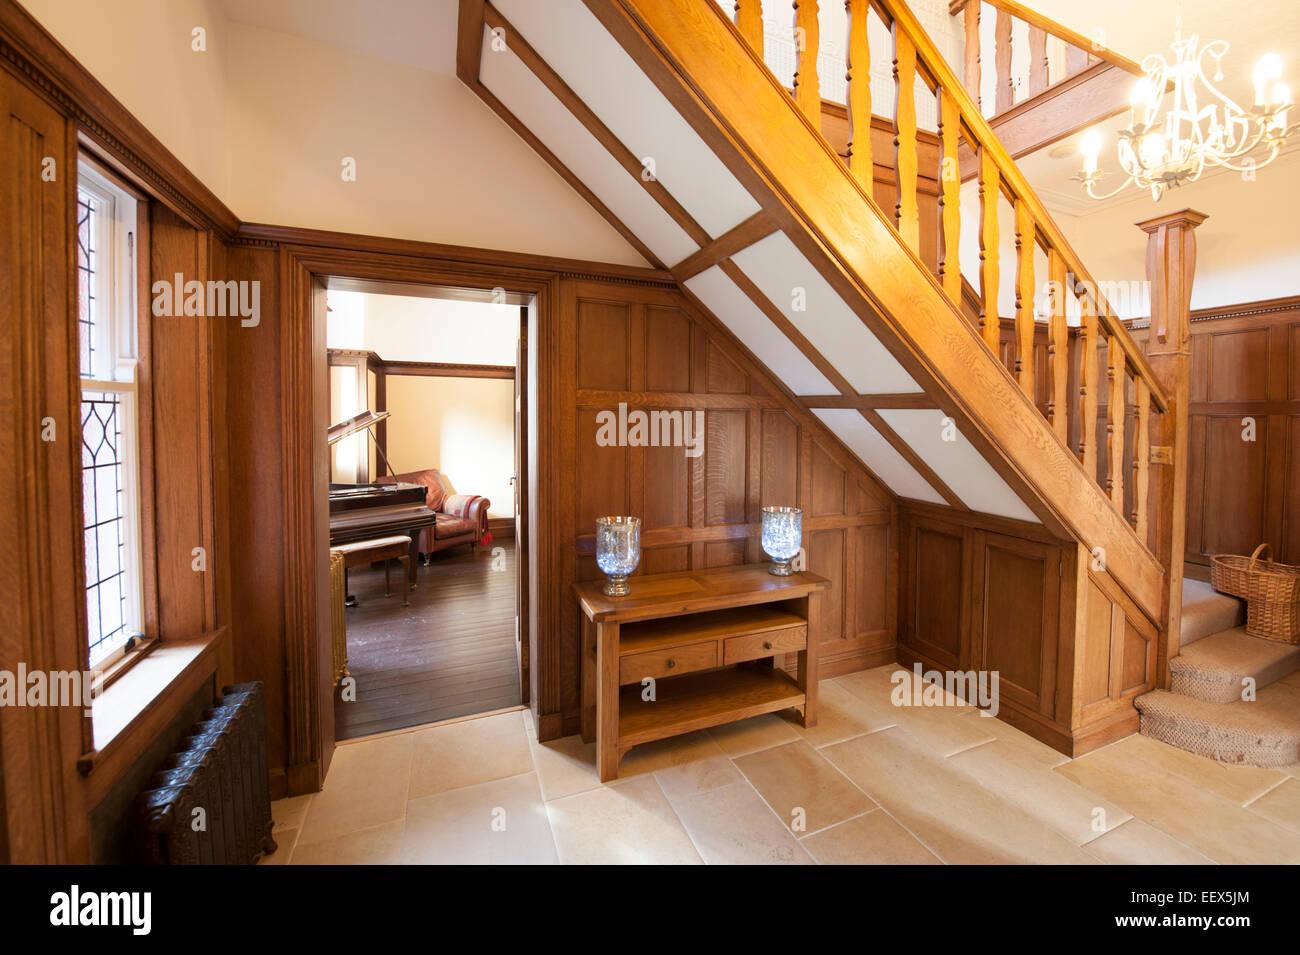 Oak Paneled House Hall Hallway entrance grand - Stock Image